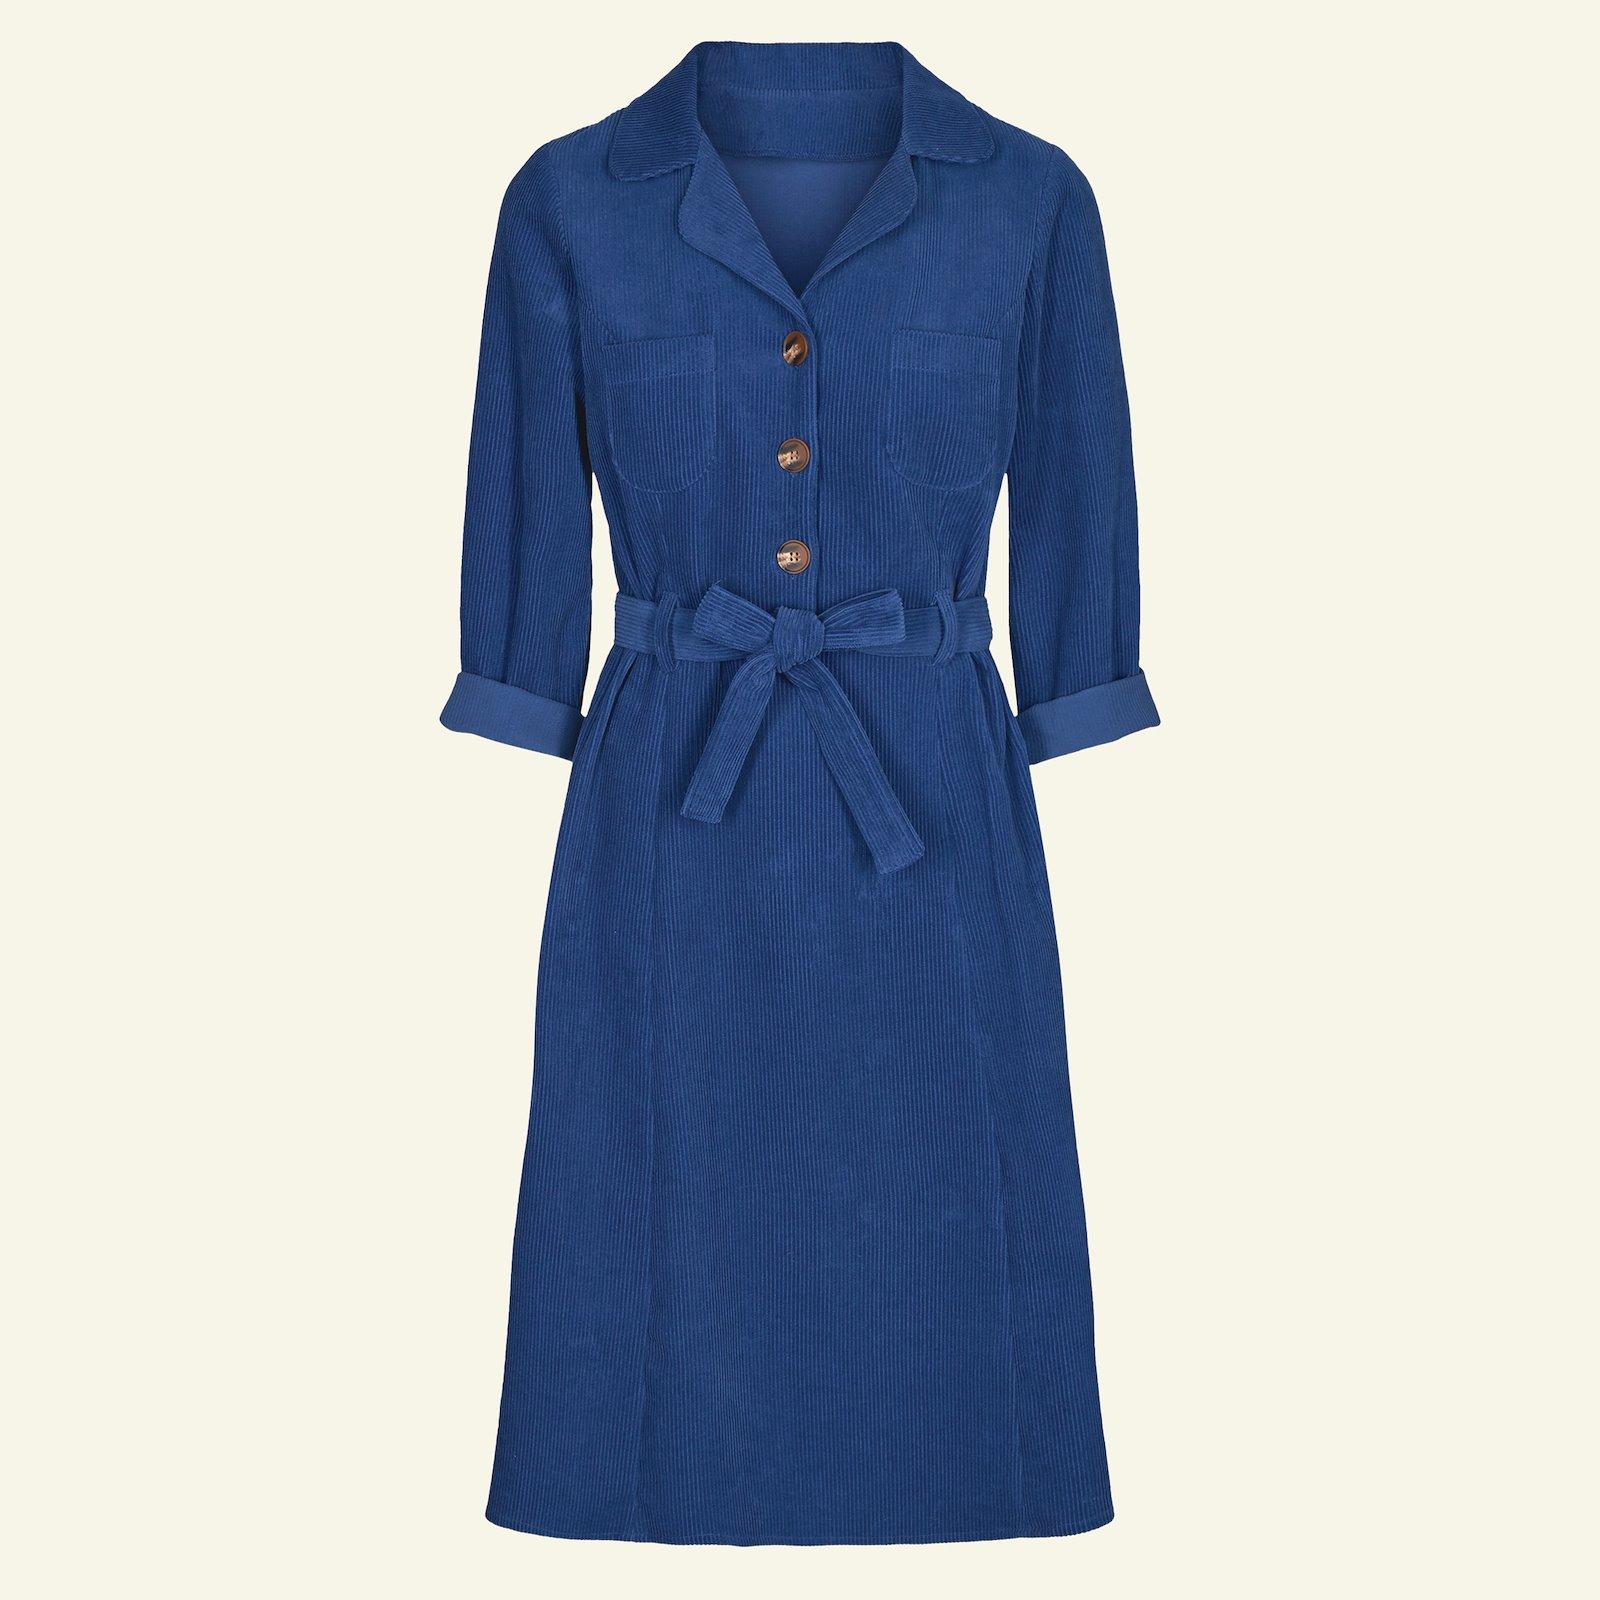 Dress, 36/8 p23075_430820_40243_sskit